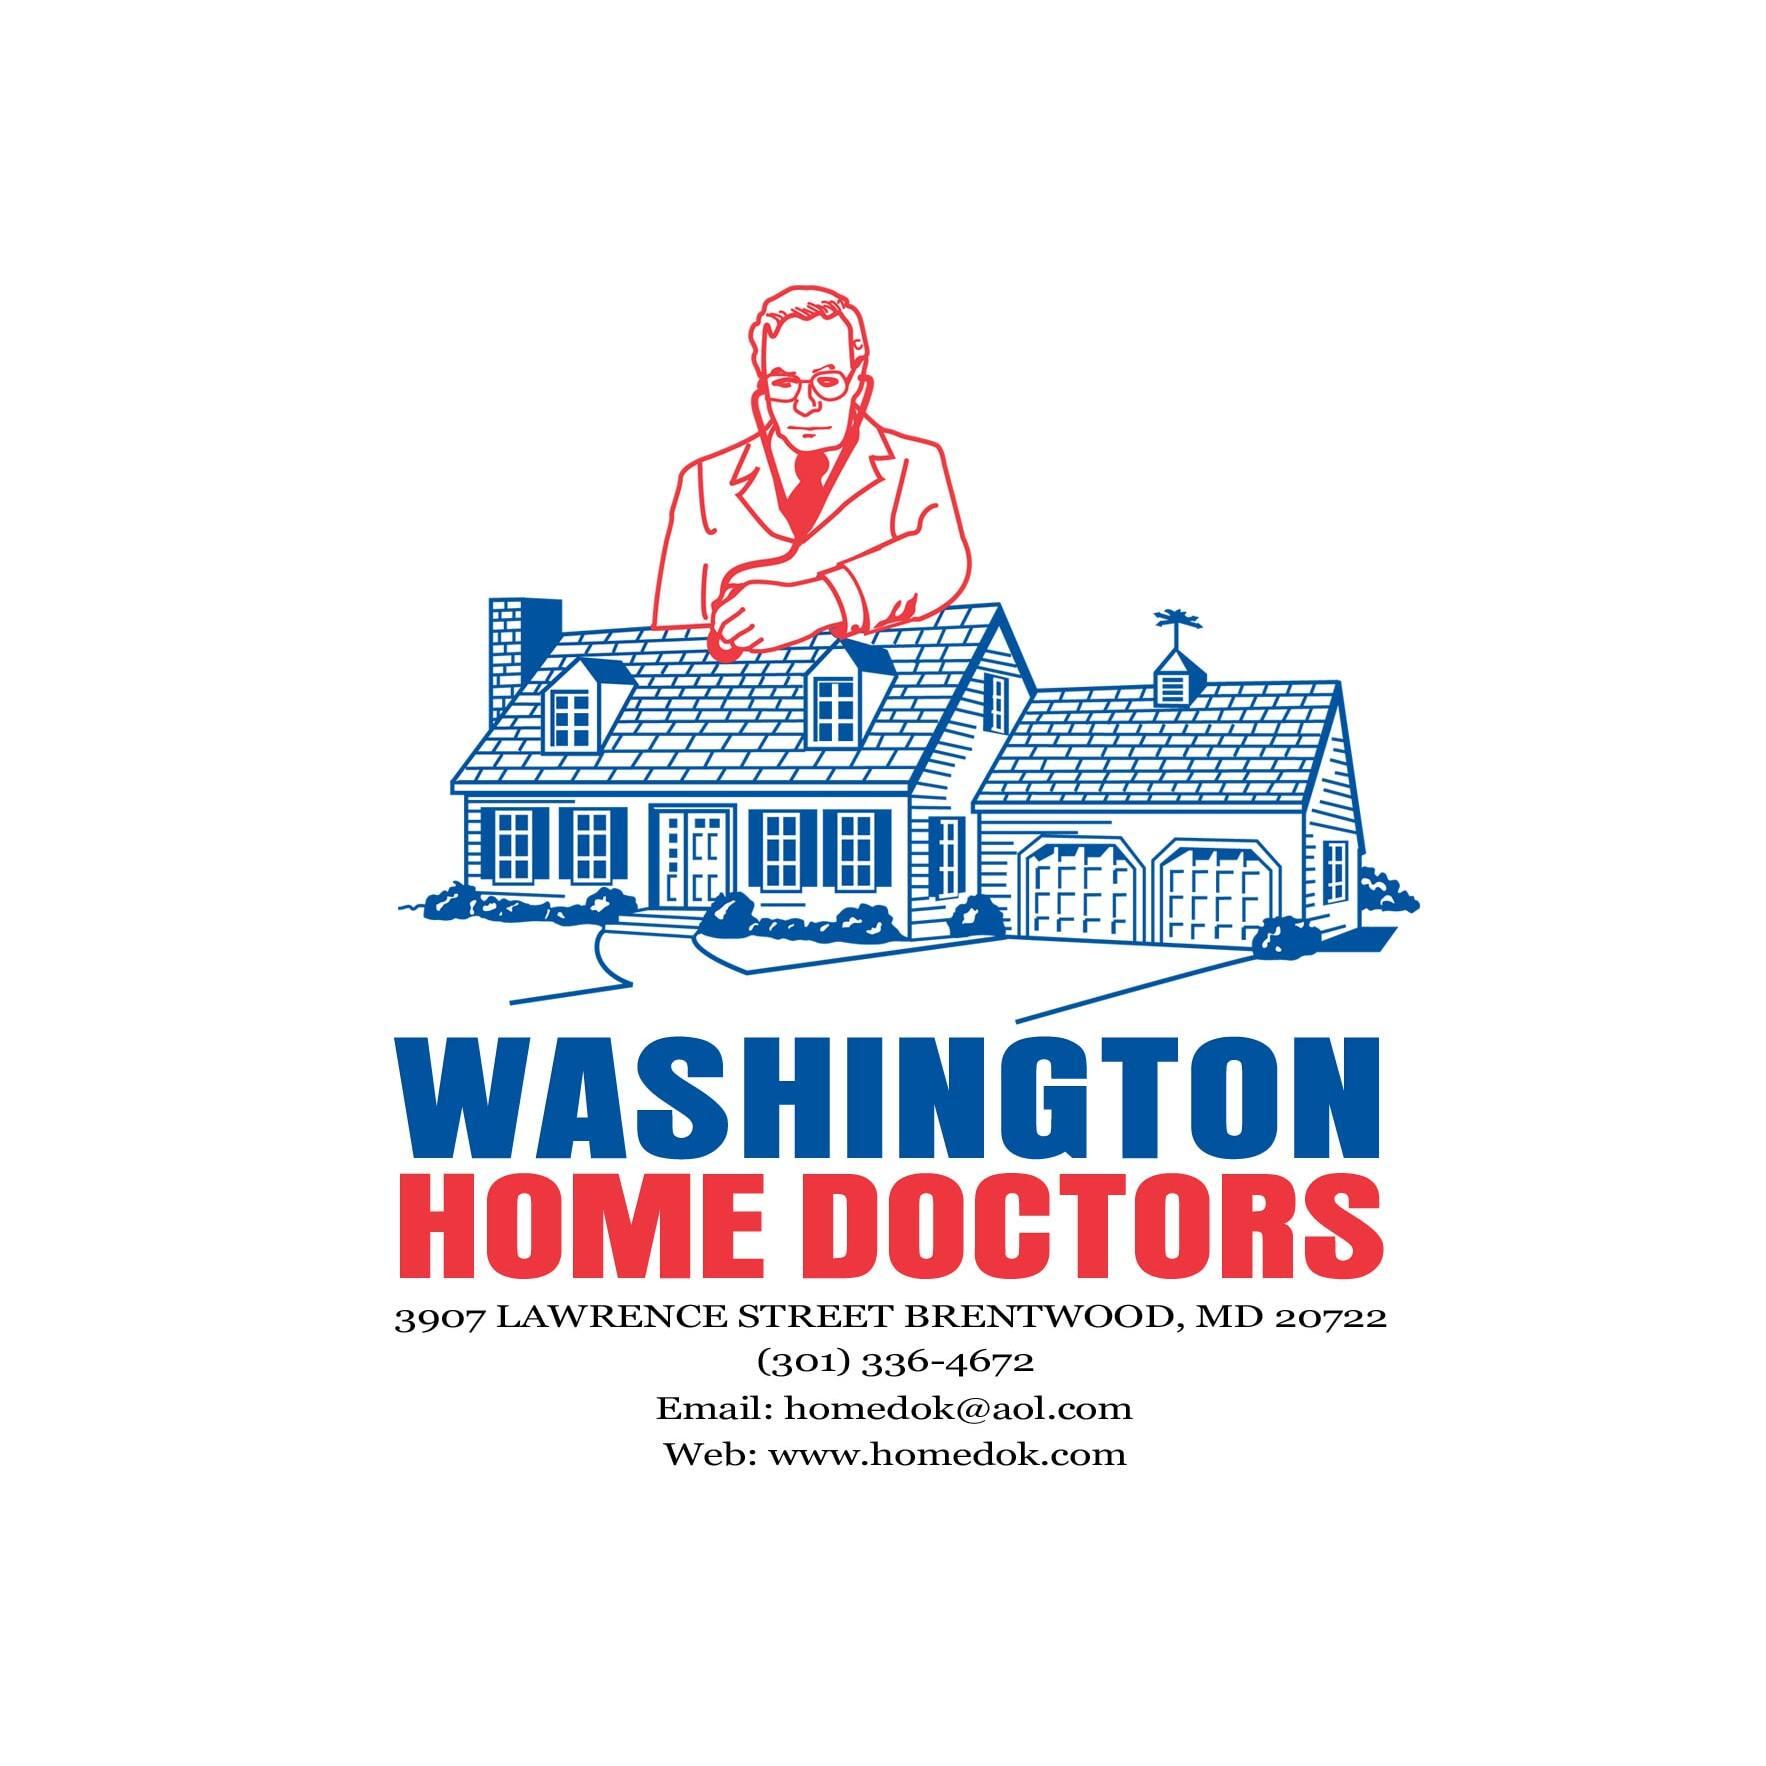 Washington Home Doctors Inc